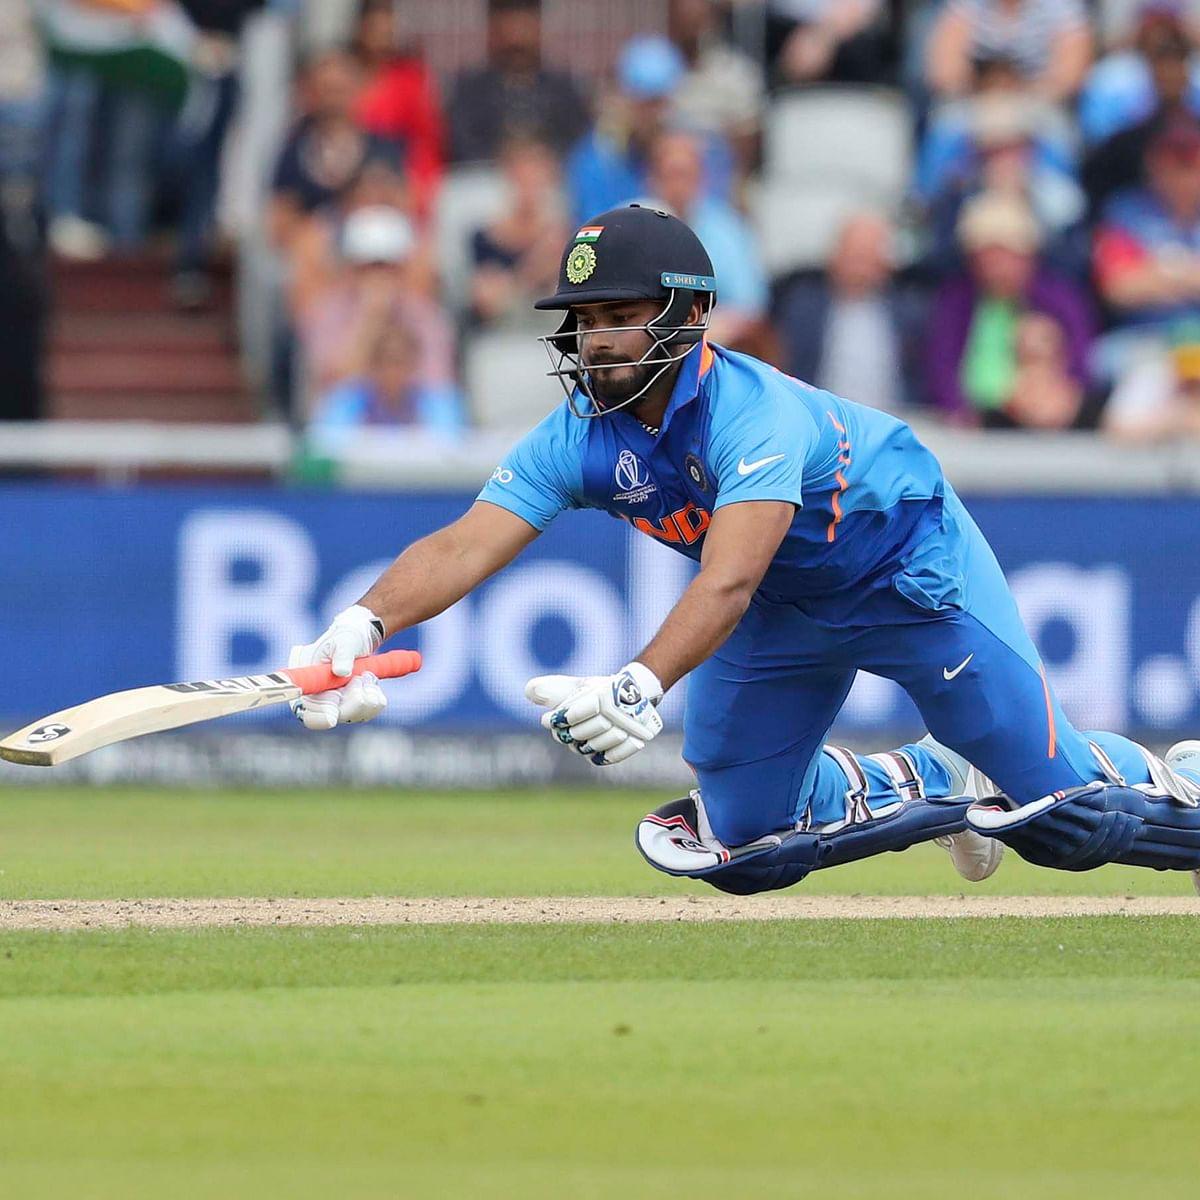 India vs New Zealand 1st Semi-Final: Rishab Pant Out on 32 runs, IND 71/5